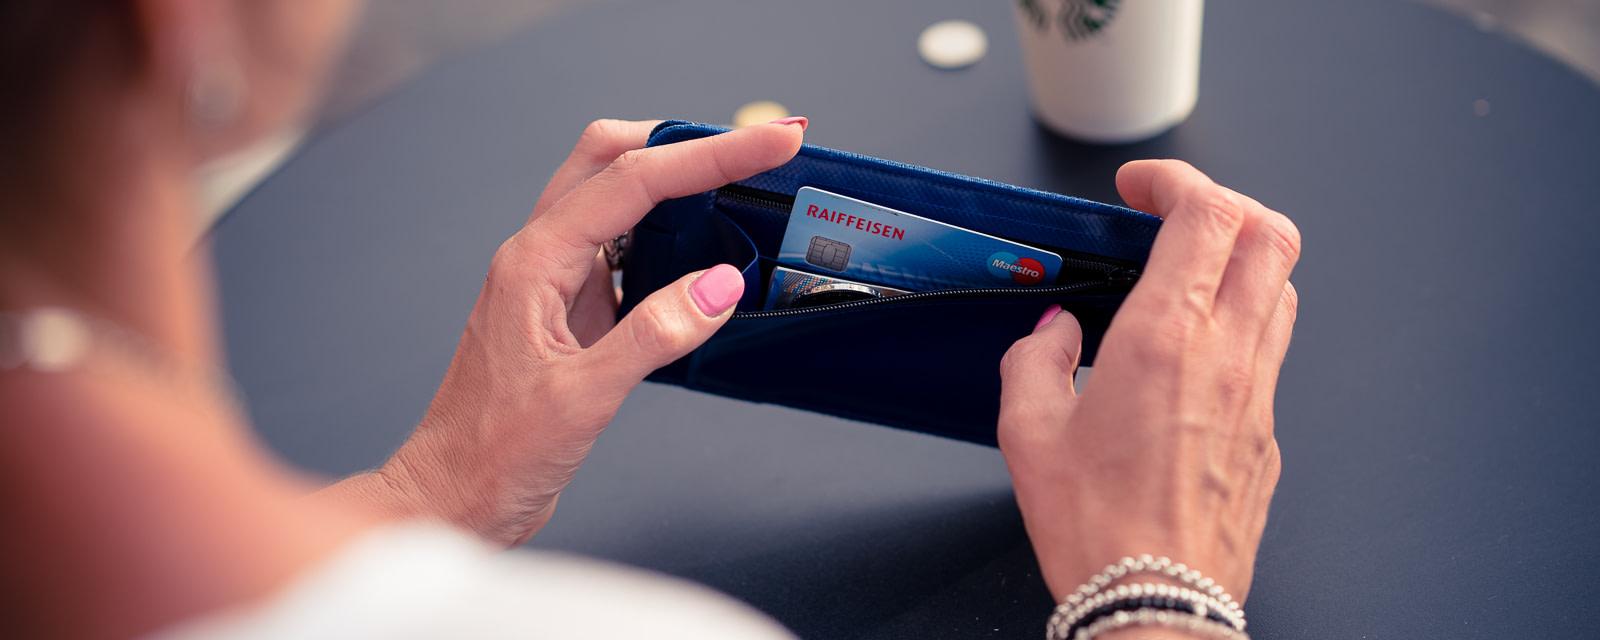 Handyhülle, iPhonehülle, Smartphonecase